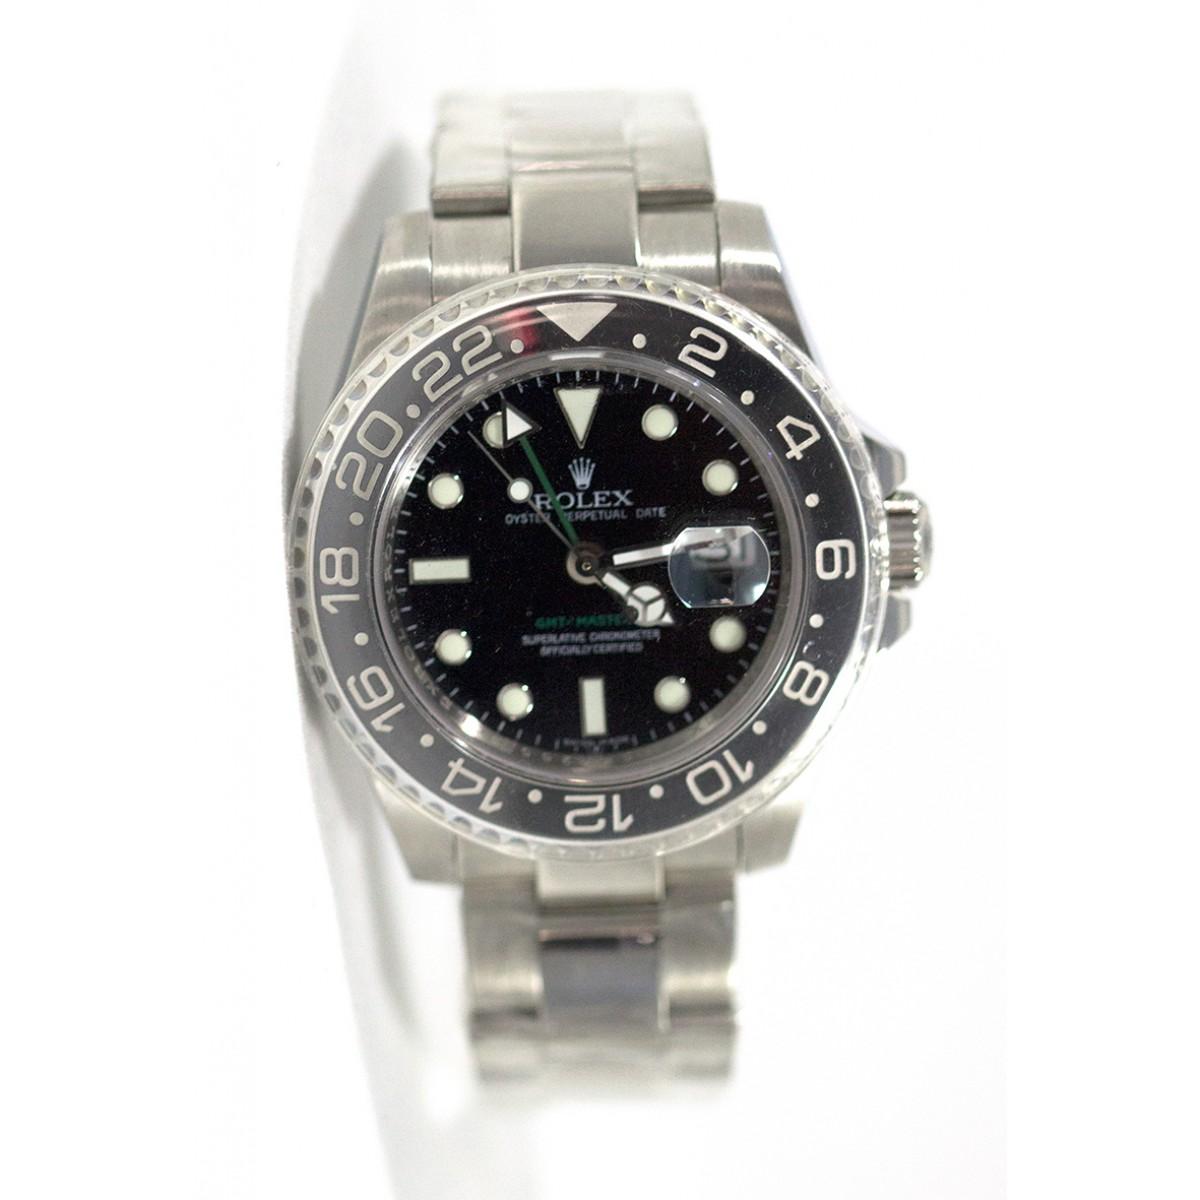 3723afec5d6 Replicas De Rolex Explorer Ii - cheap watches mgc-gas.com